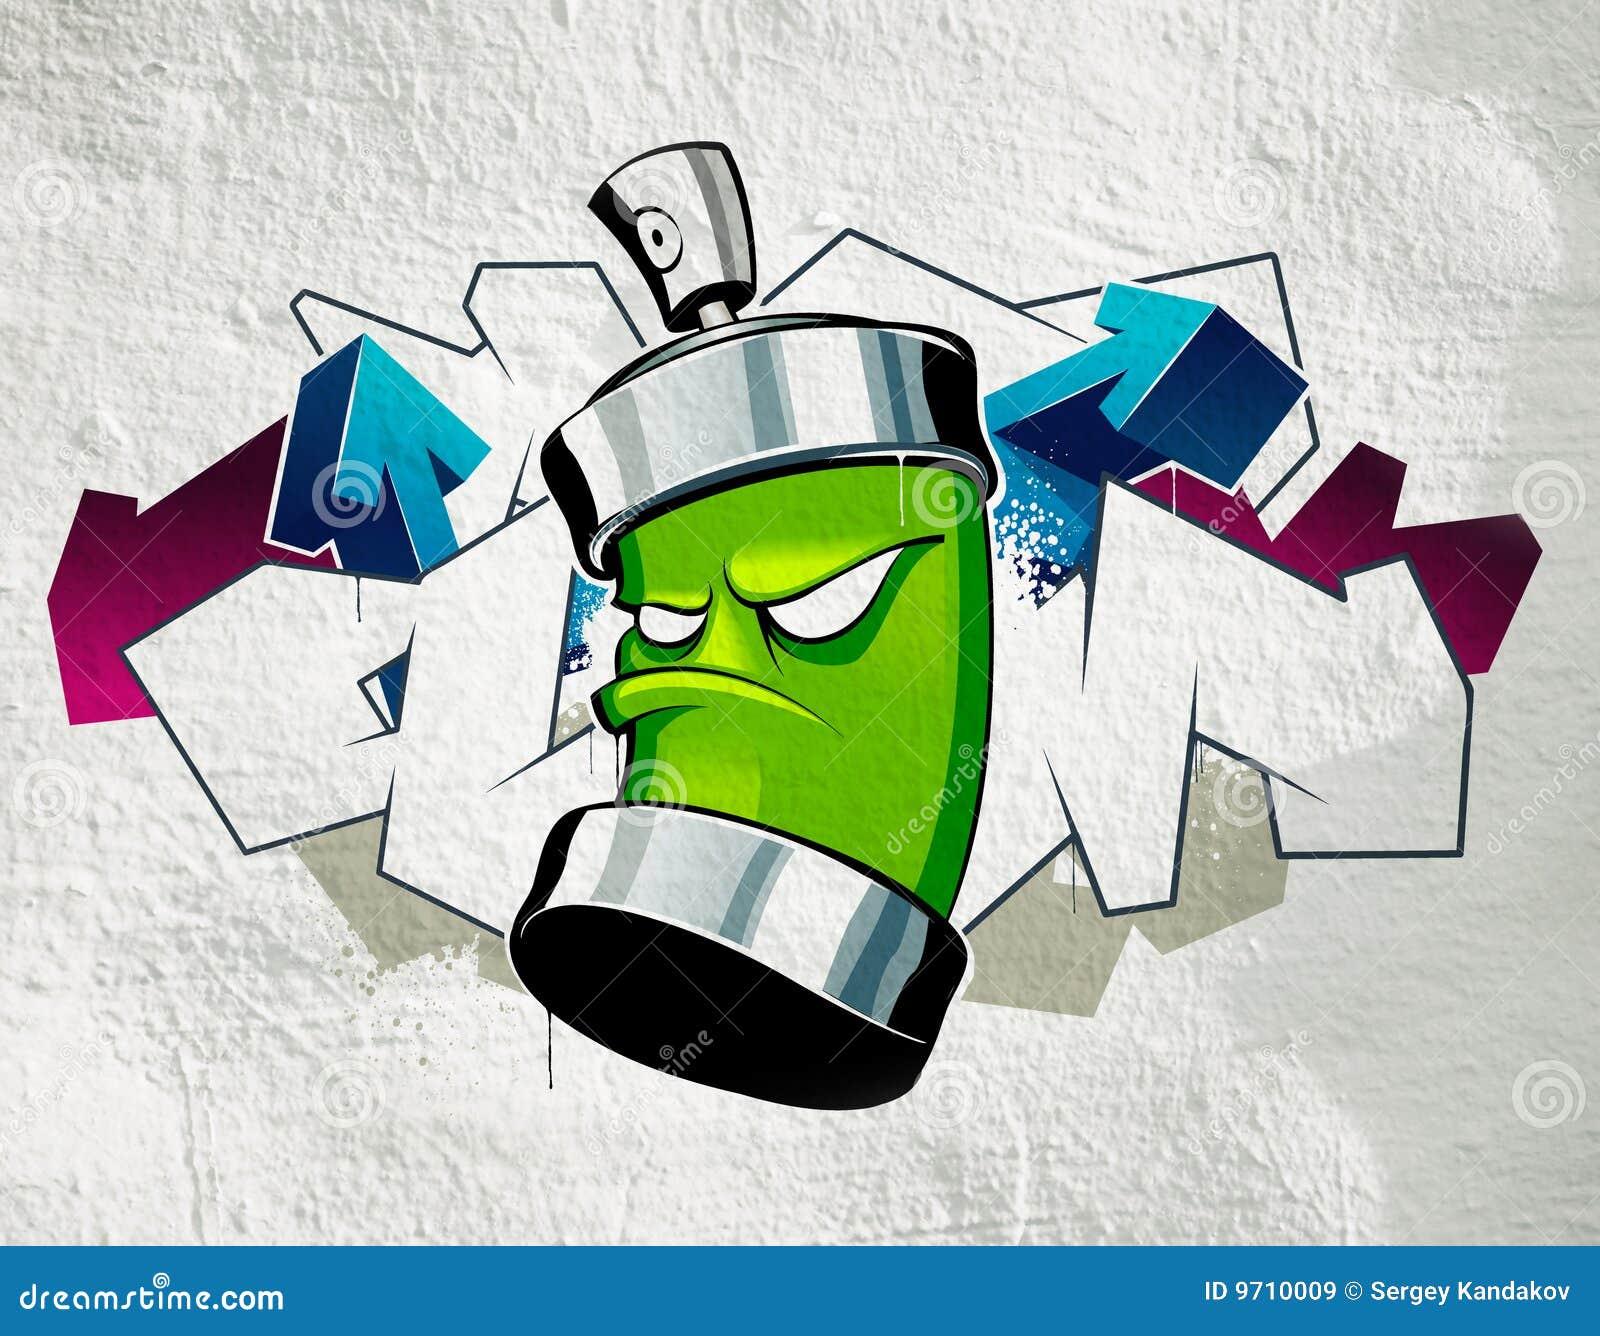 cool graffiti stock illustration illustration of extreme 9710009